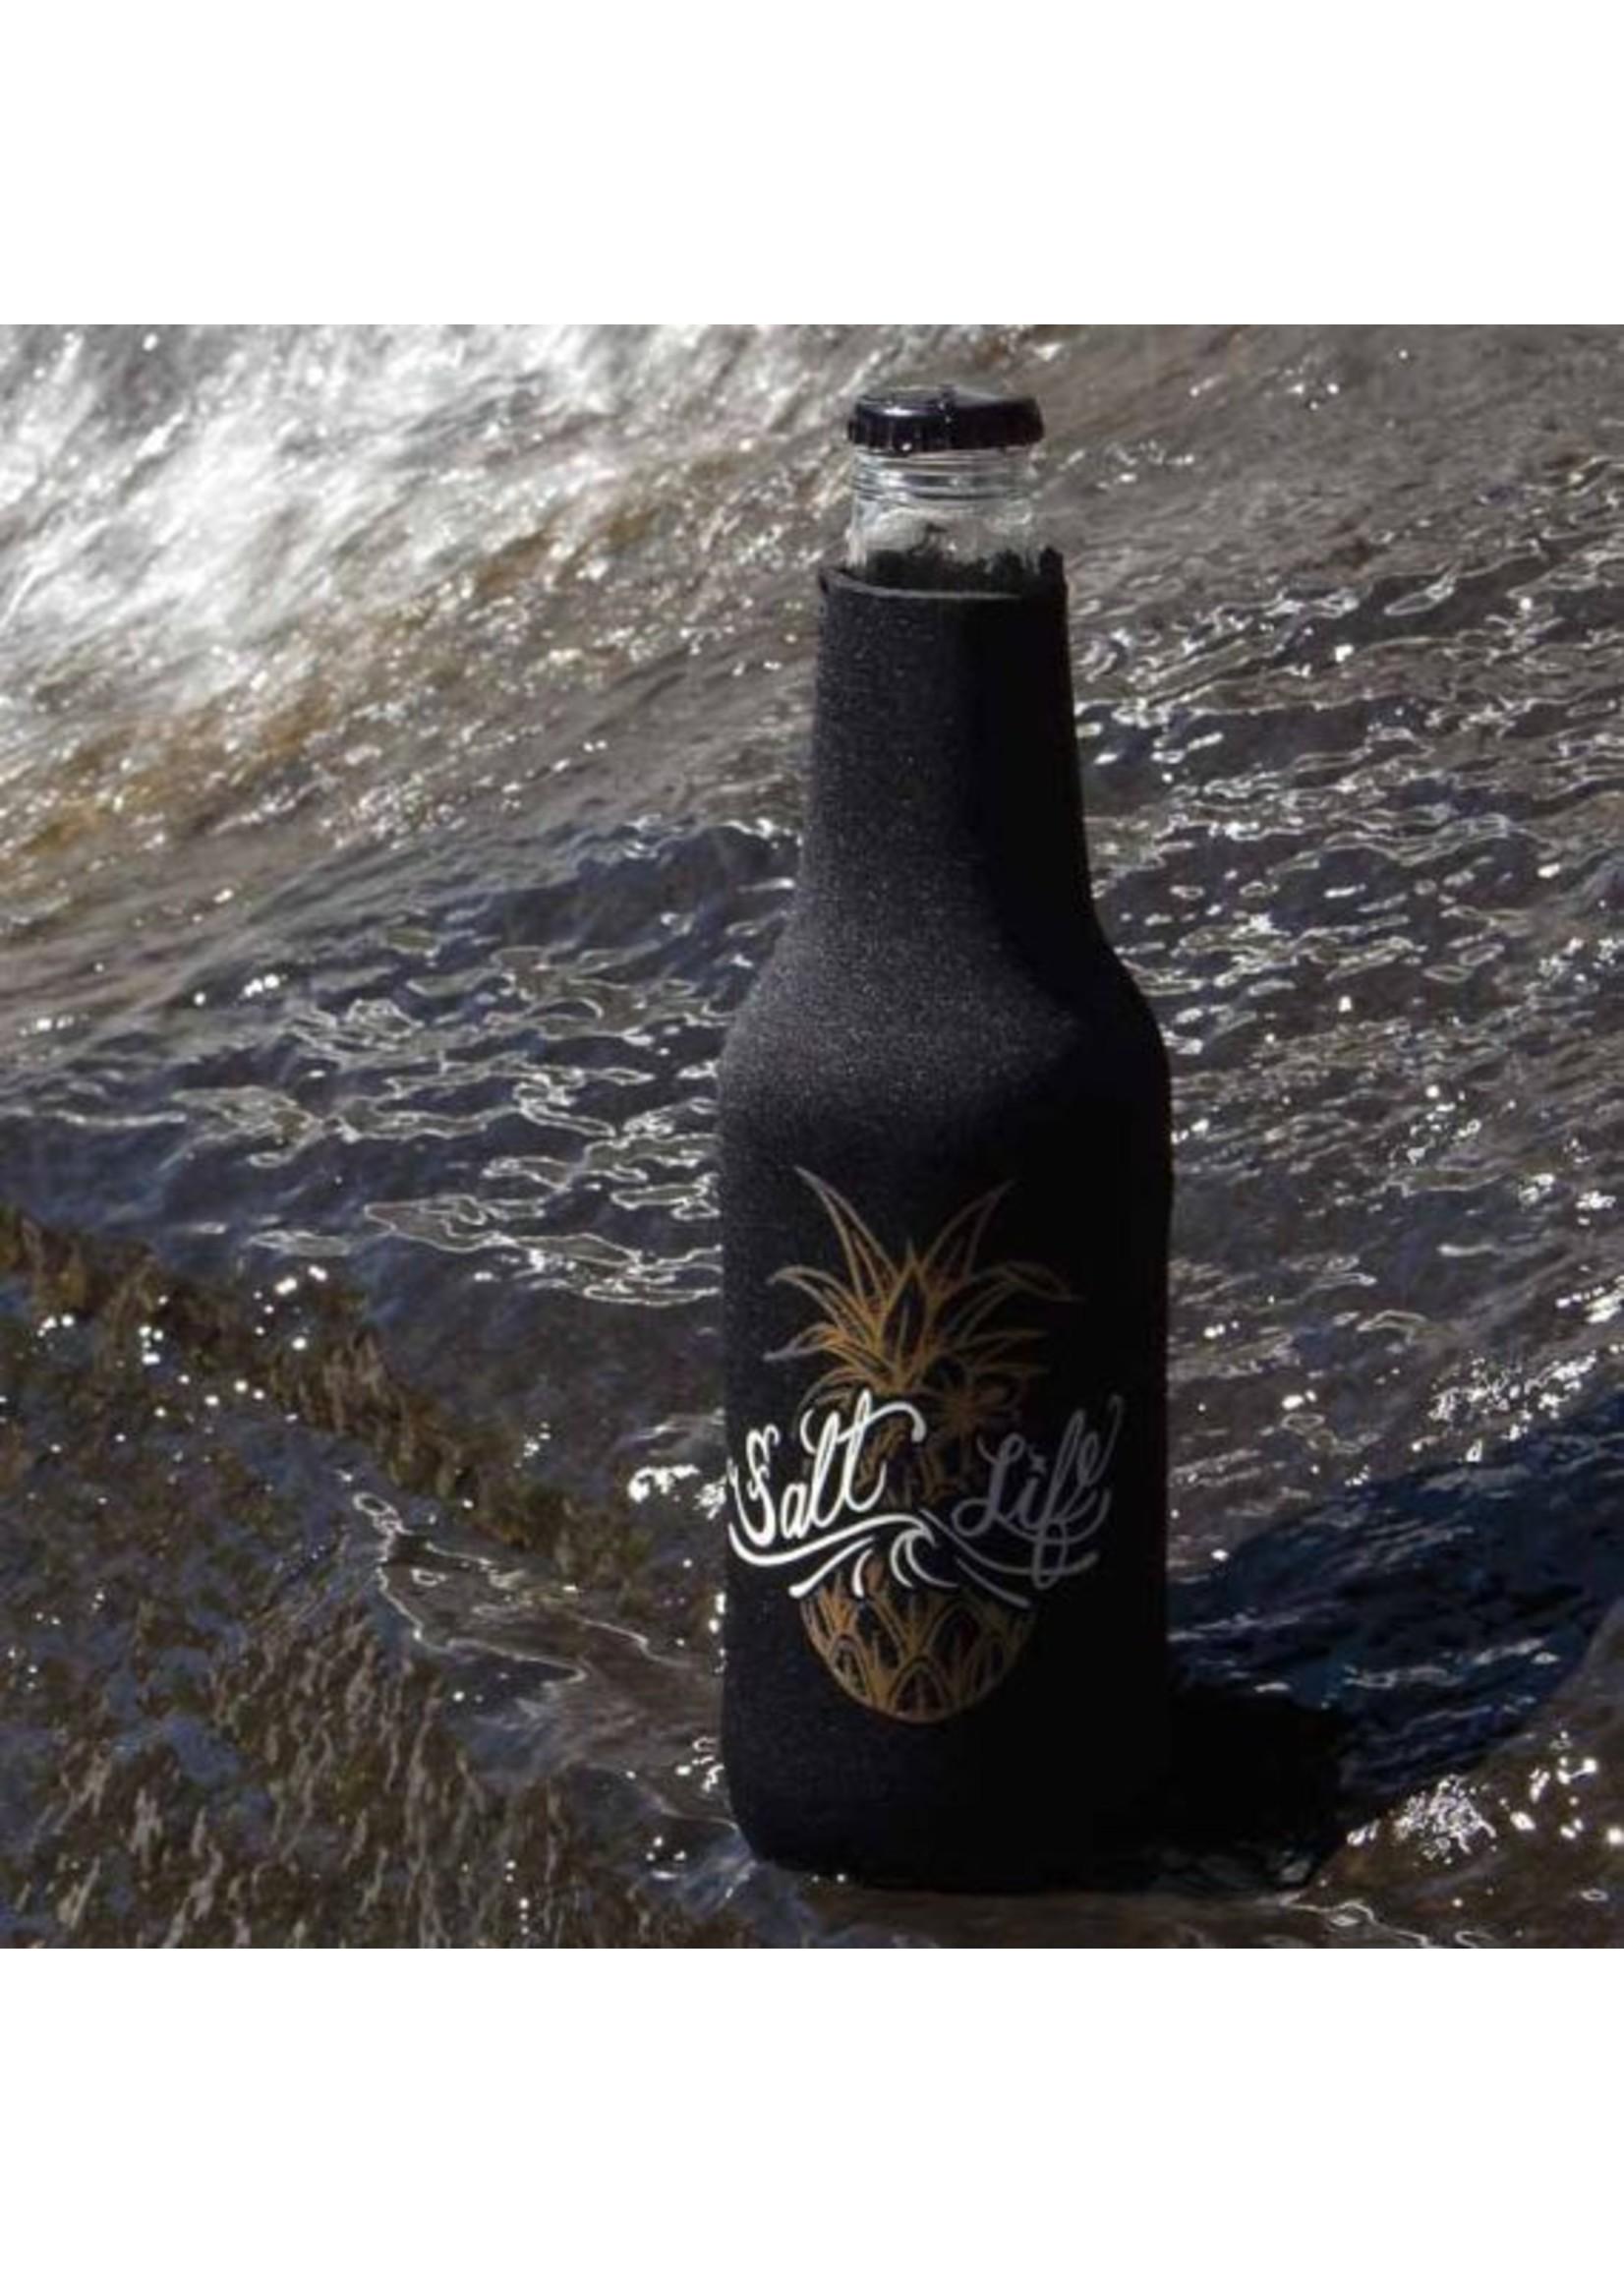 Salt Life Signature Pineapple Bottle Holder